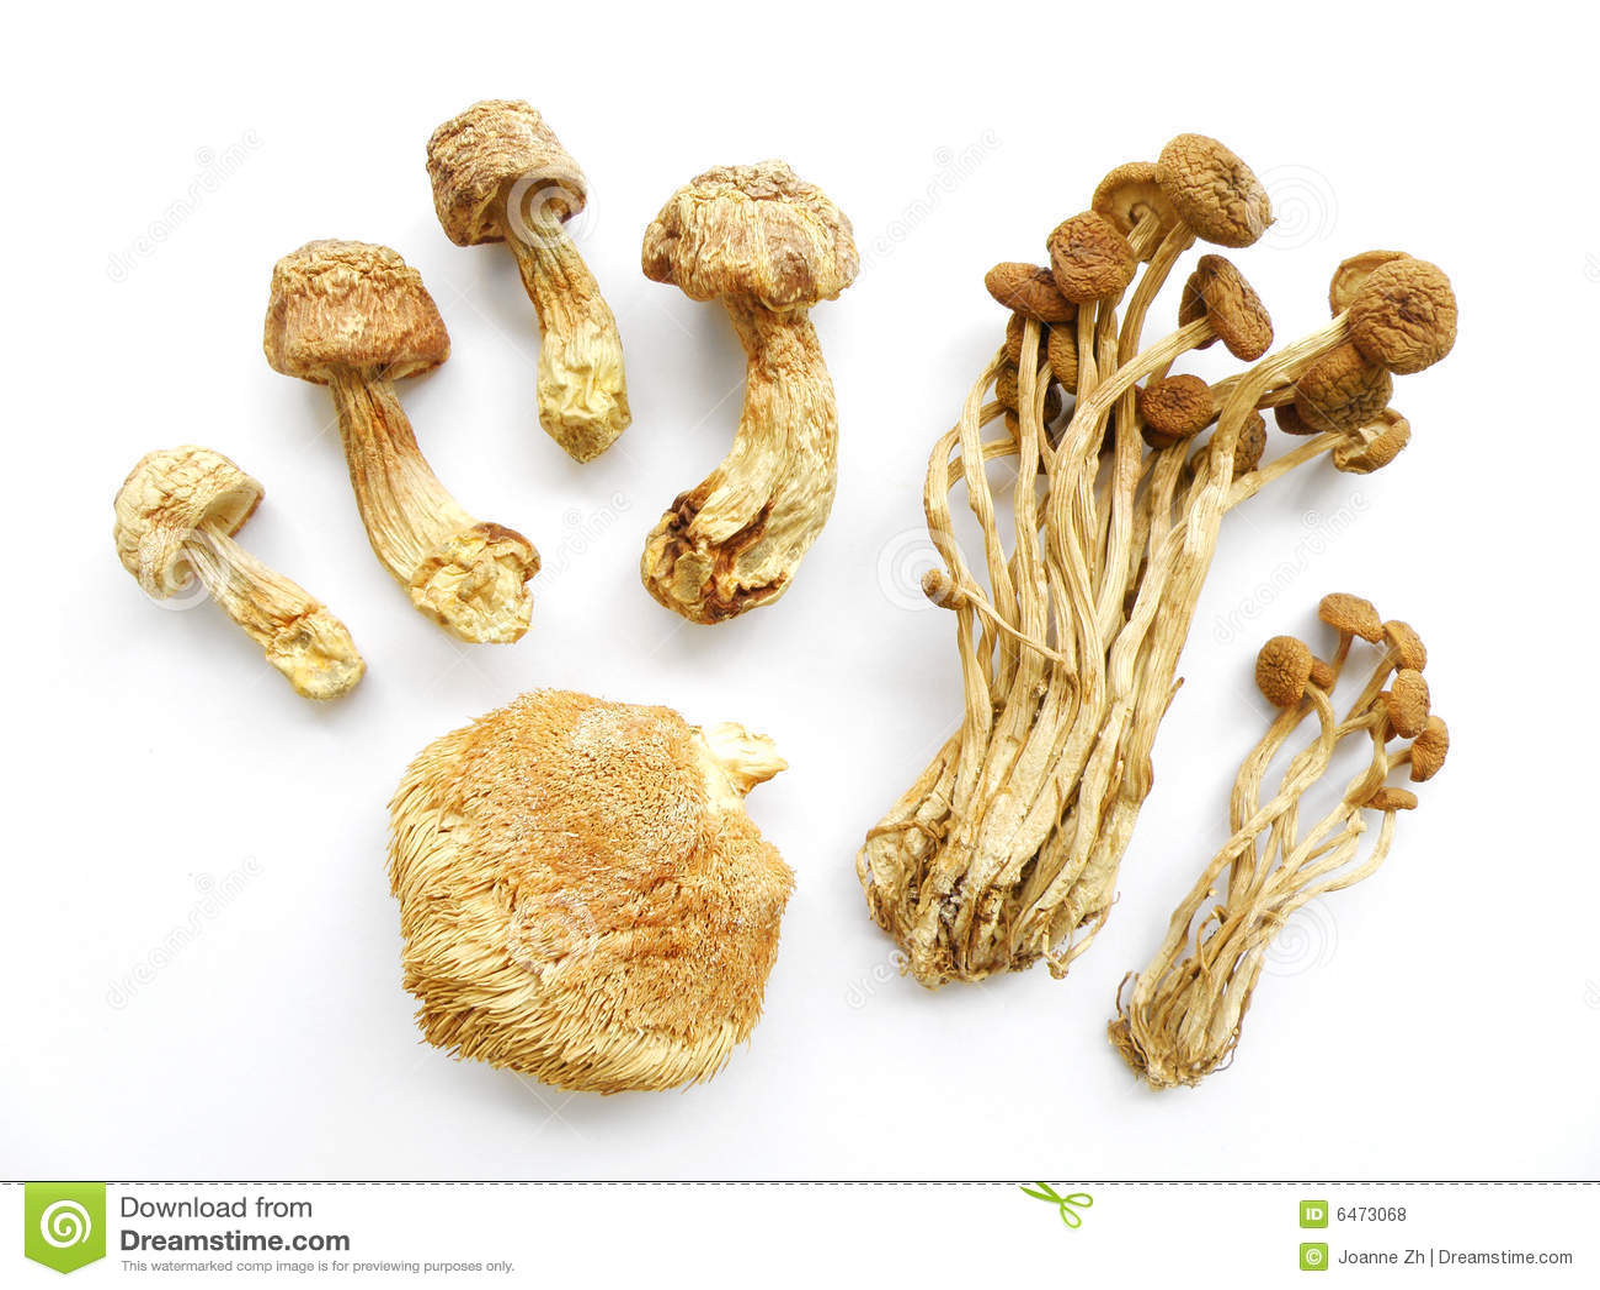 Assorted dried mushrooms